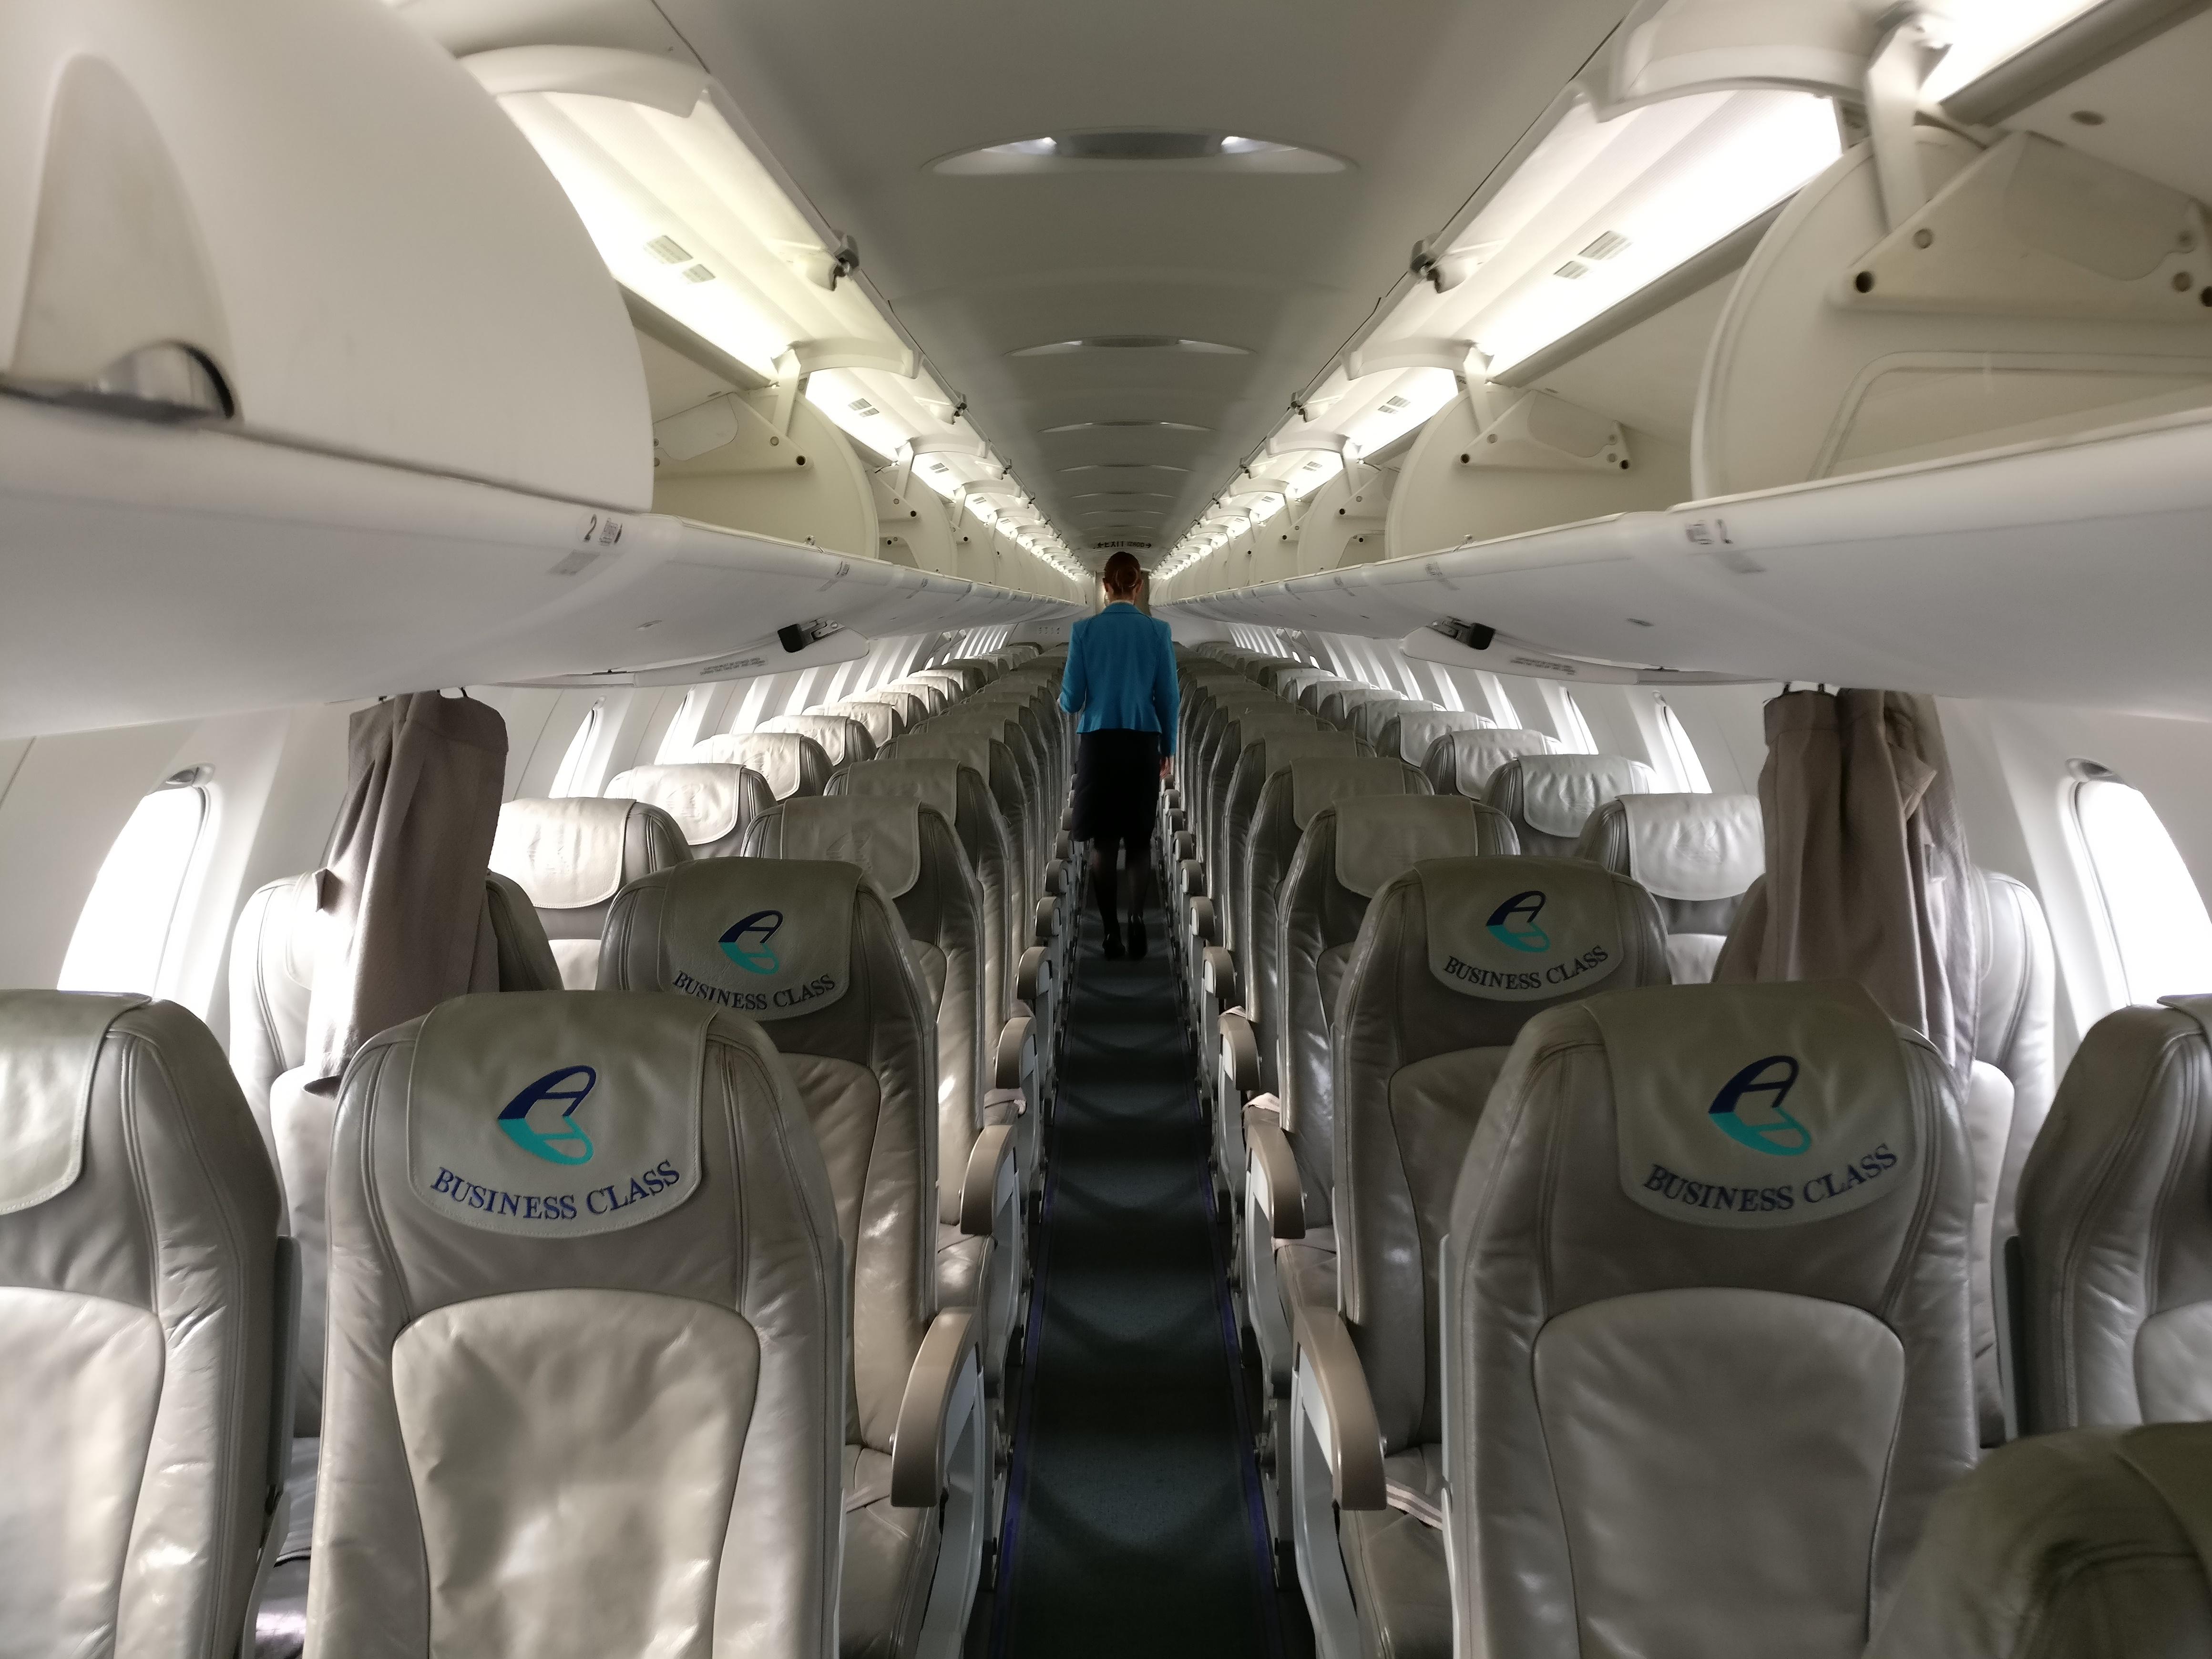 Adria Airways Economy Class Seating